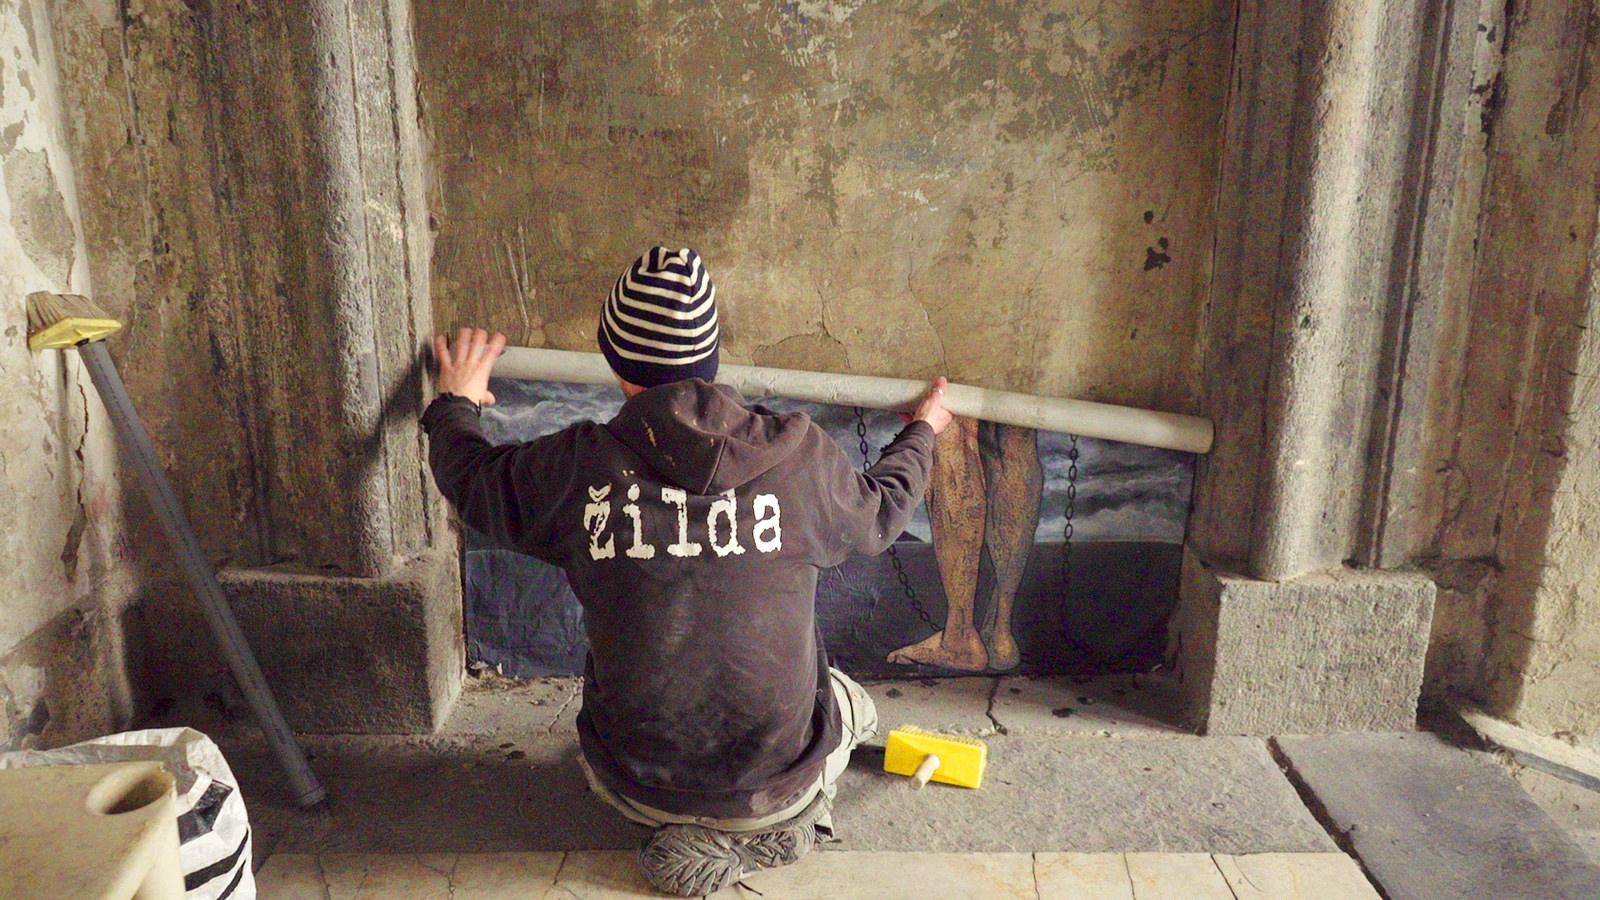 zilda-new-piece-in-palazzo-sanfelice-naples-01